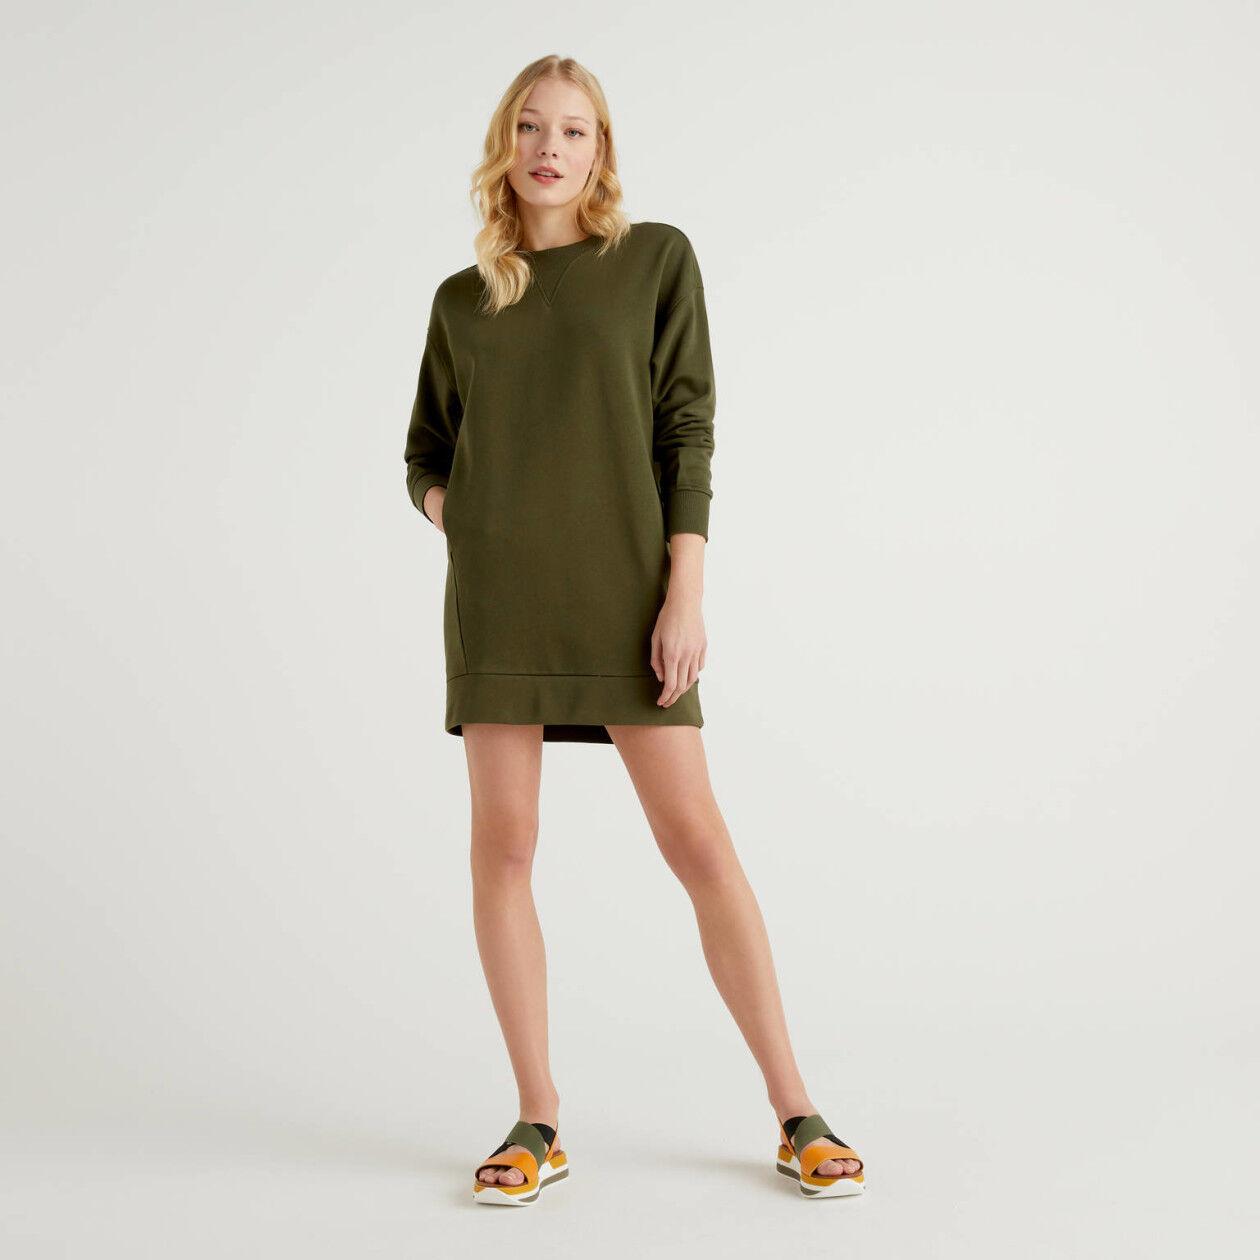 Dress in 100% sweat cotton